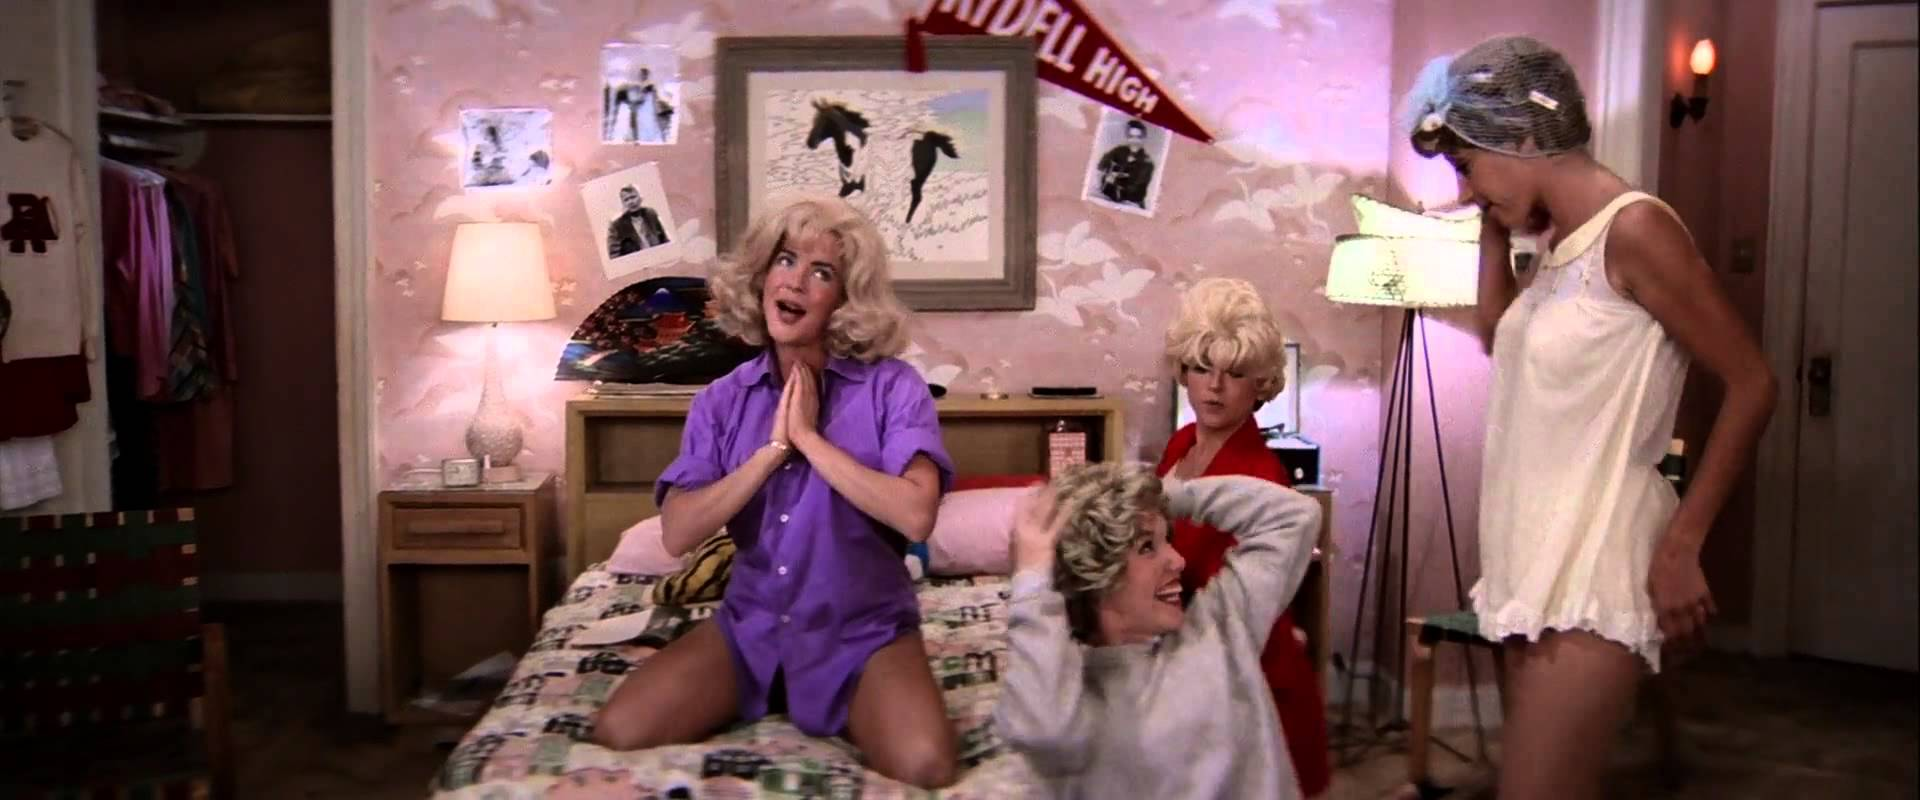 when 70s girls sang the 50s boy songs ninas soap bubble box